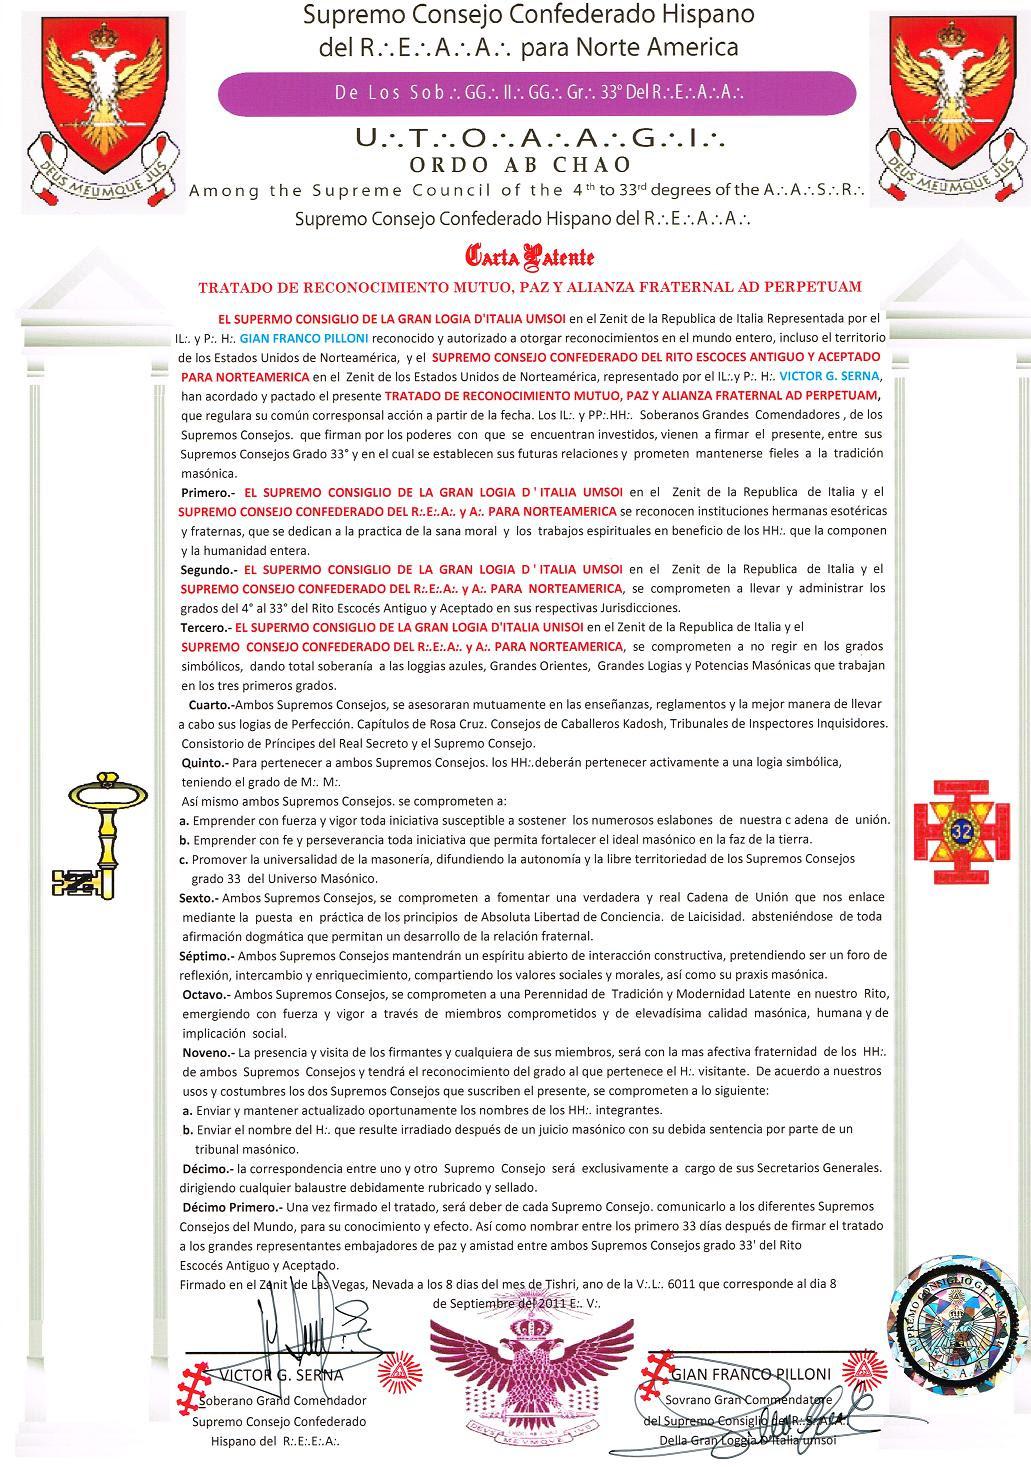 carta_patente